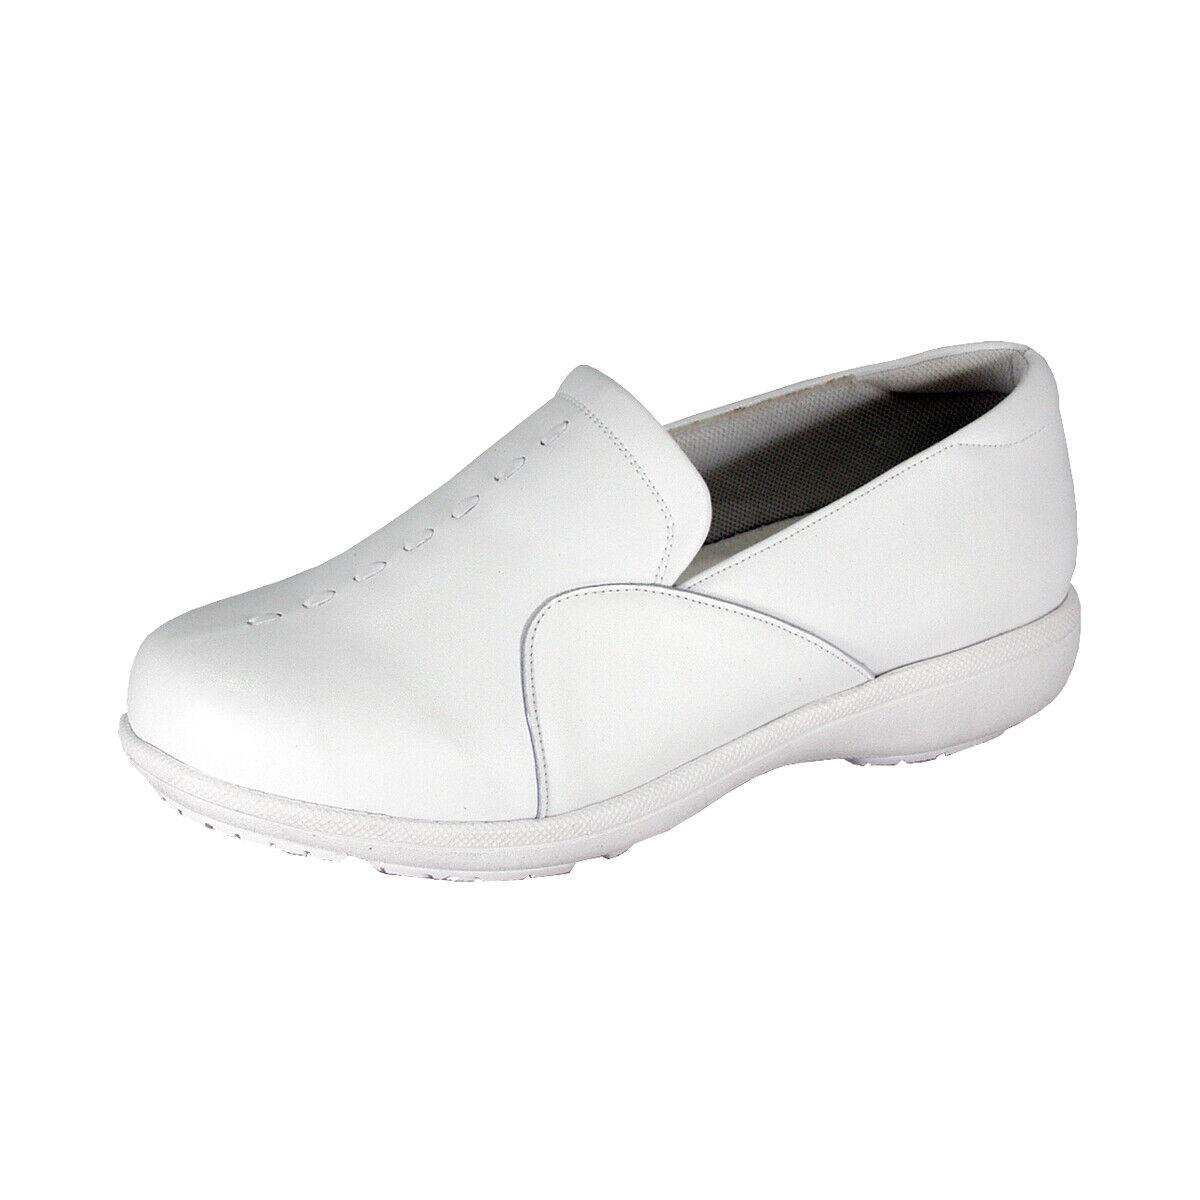 d495a1d37627 👠 FLORAL Jenna Women Wide Width Glittery Rhinestone Straps Dress Sandals 👠